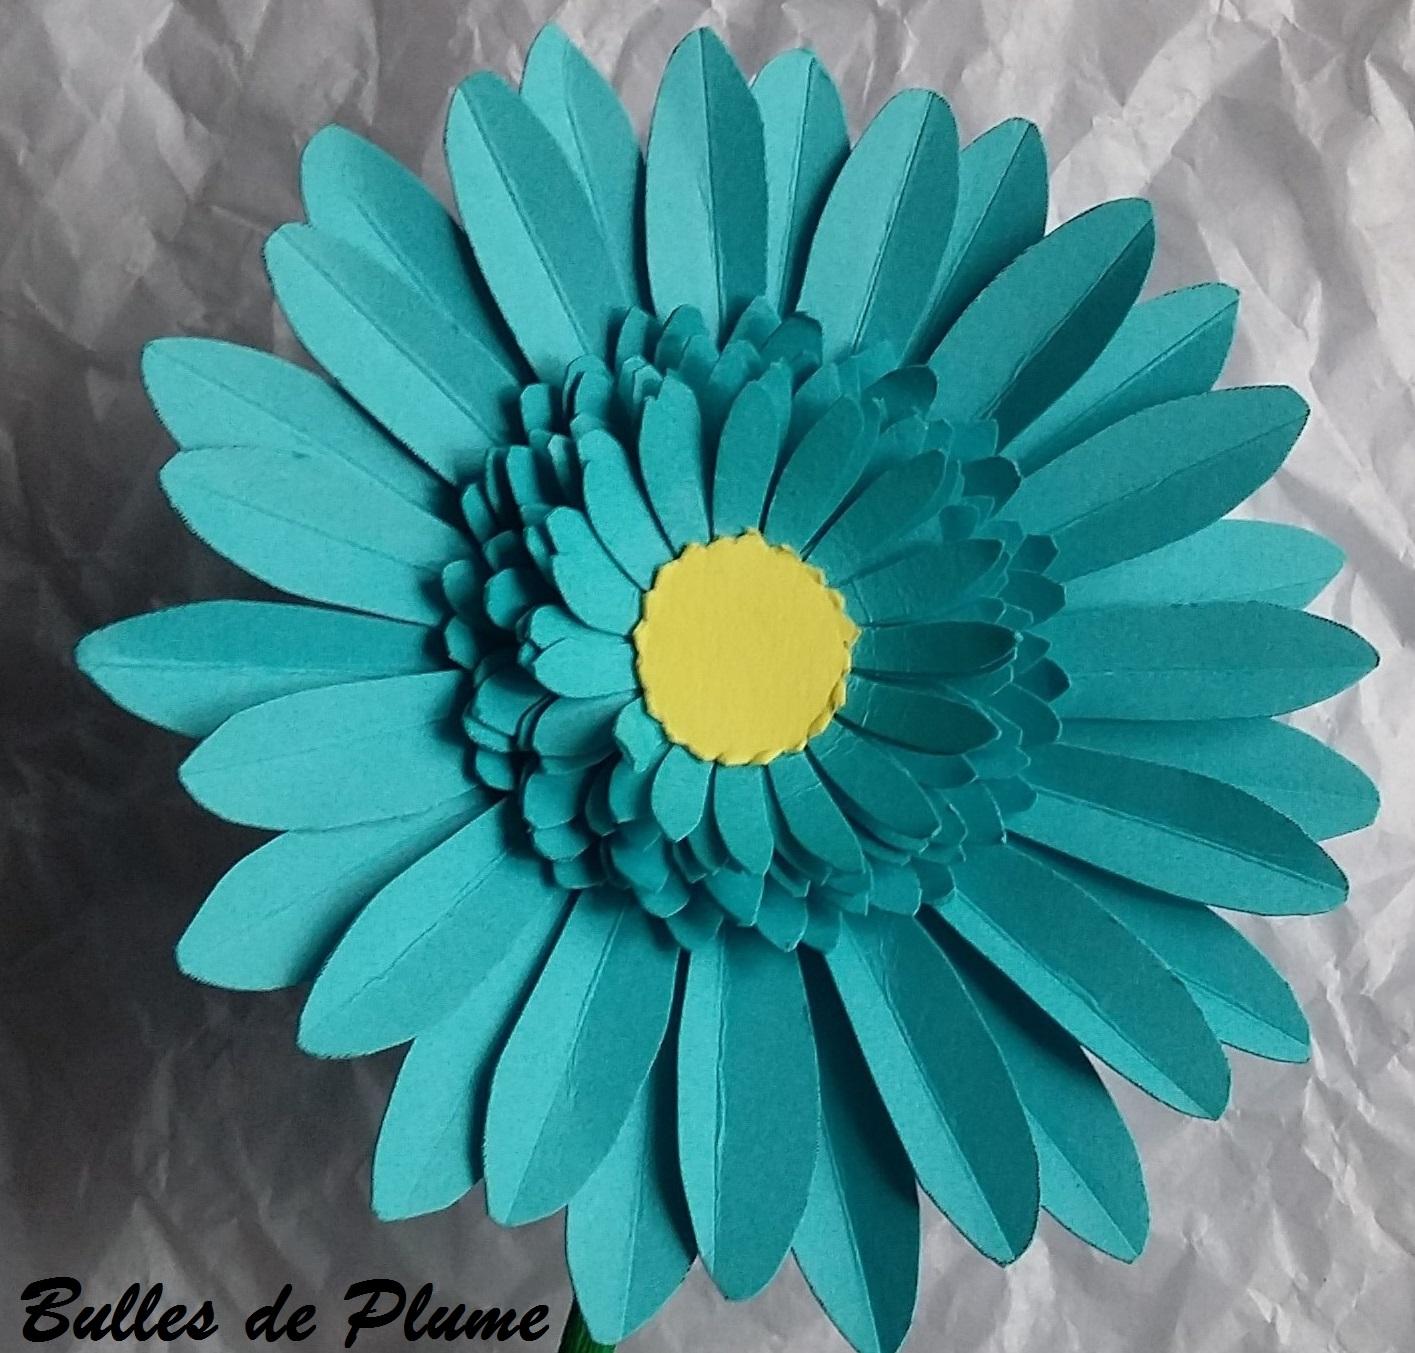 bulles de plume diy fleurs gerbera en papier. Black Bedroom Furniture Sets. Home Design Ideas